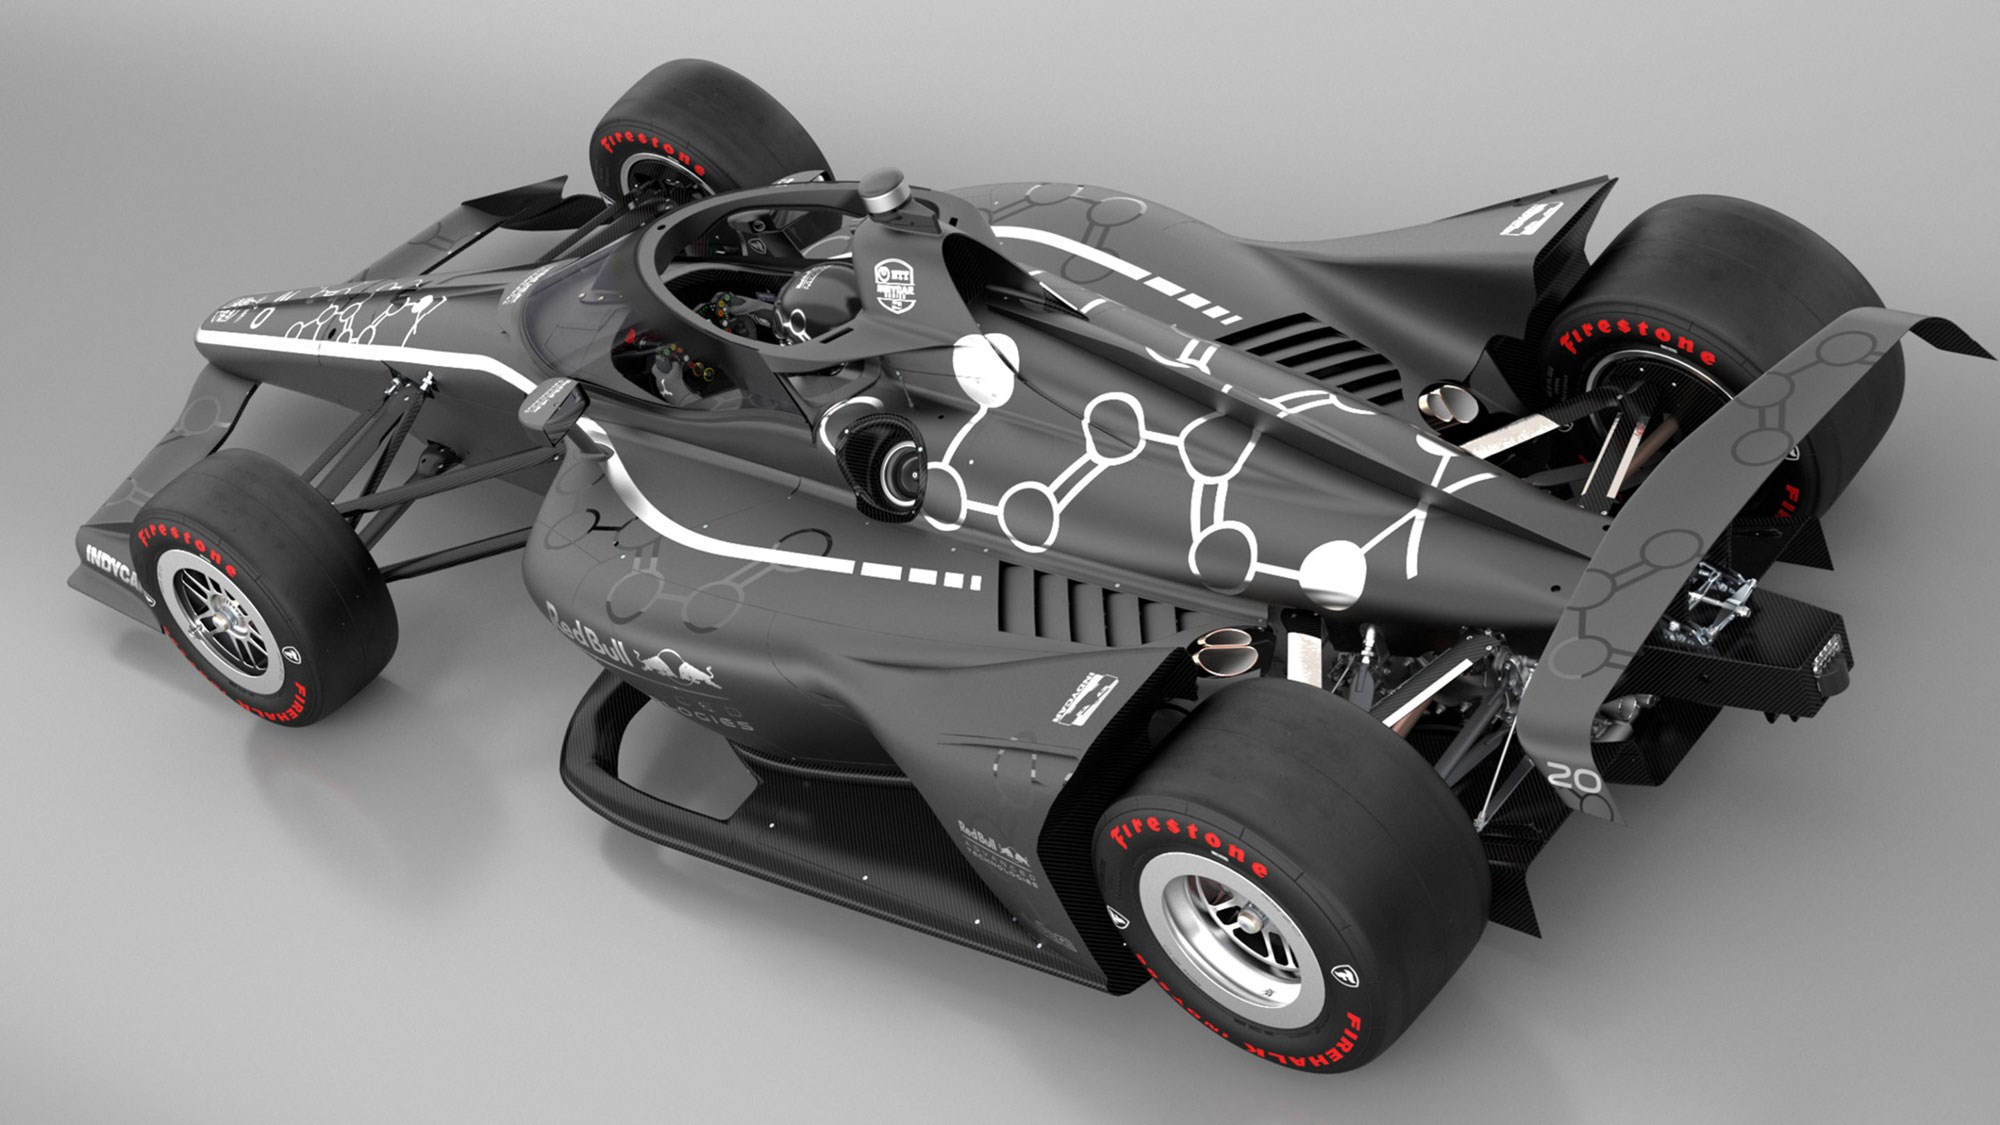 Red bull f1 2020 car